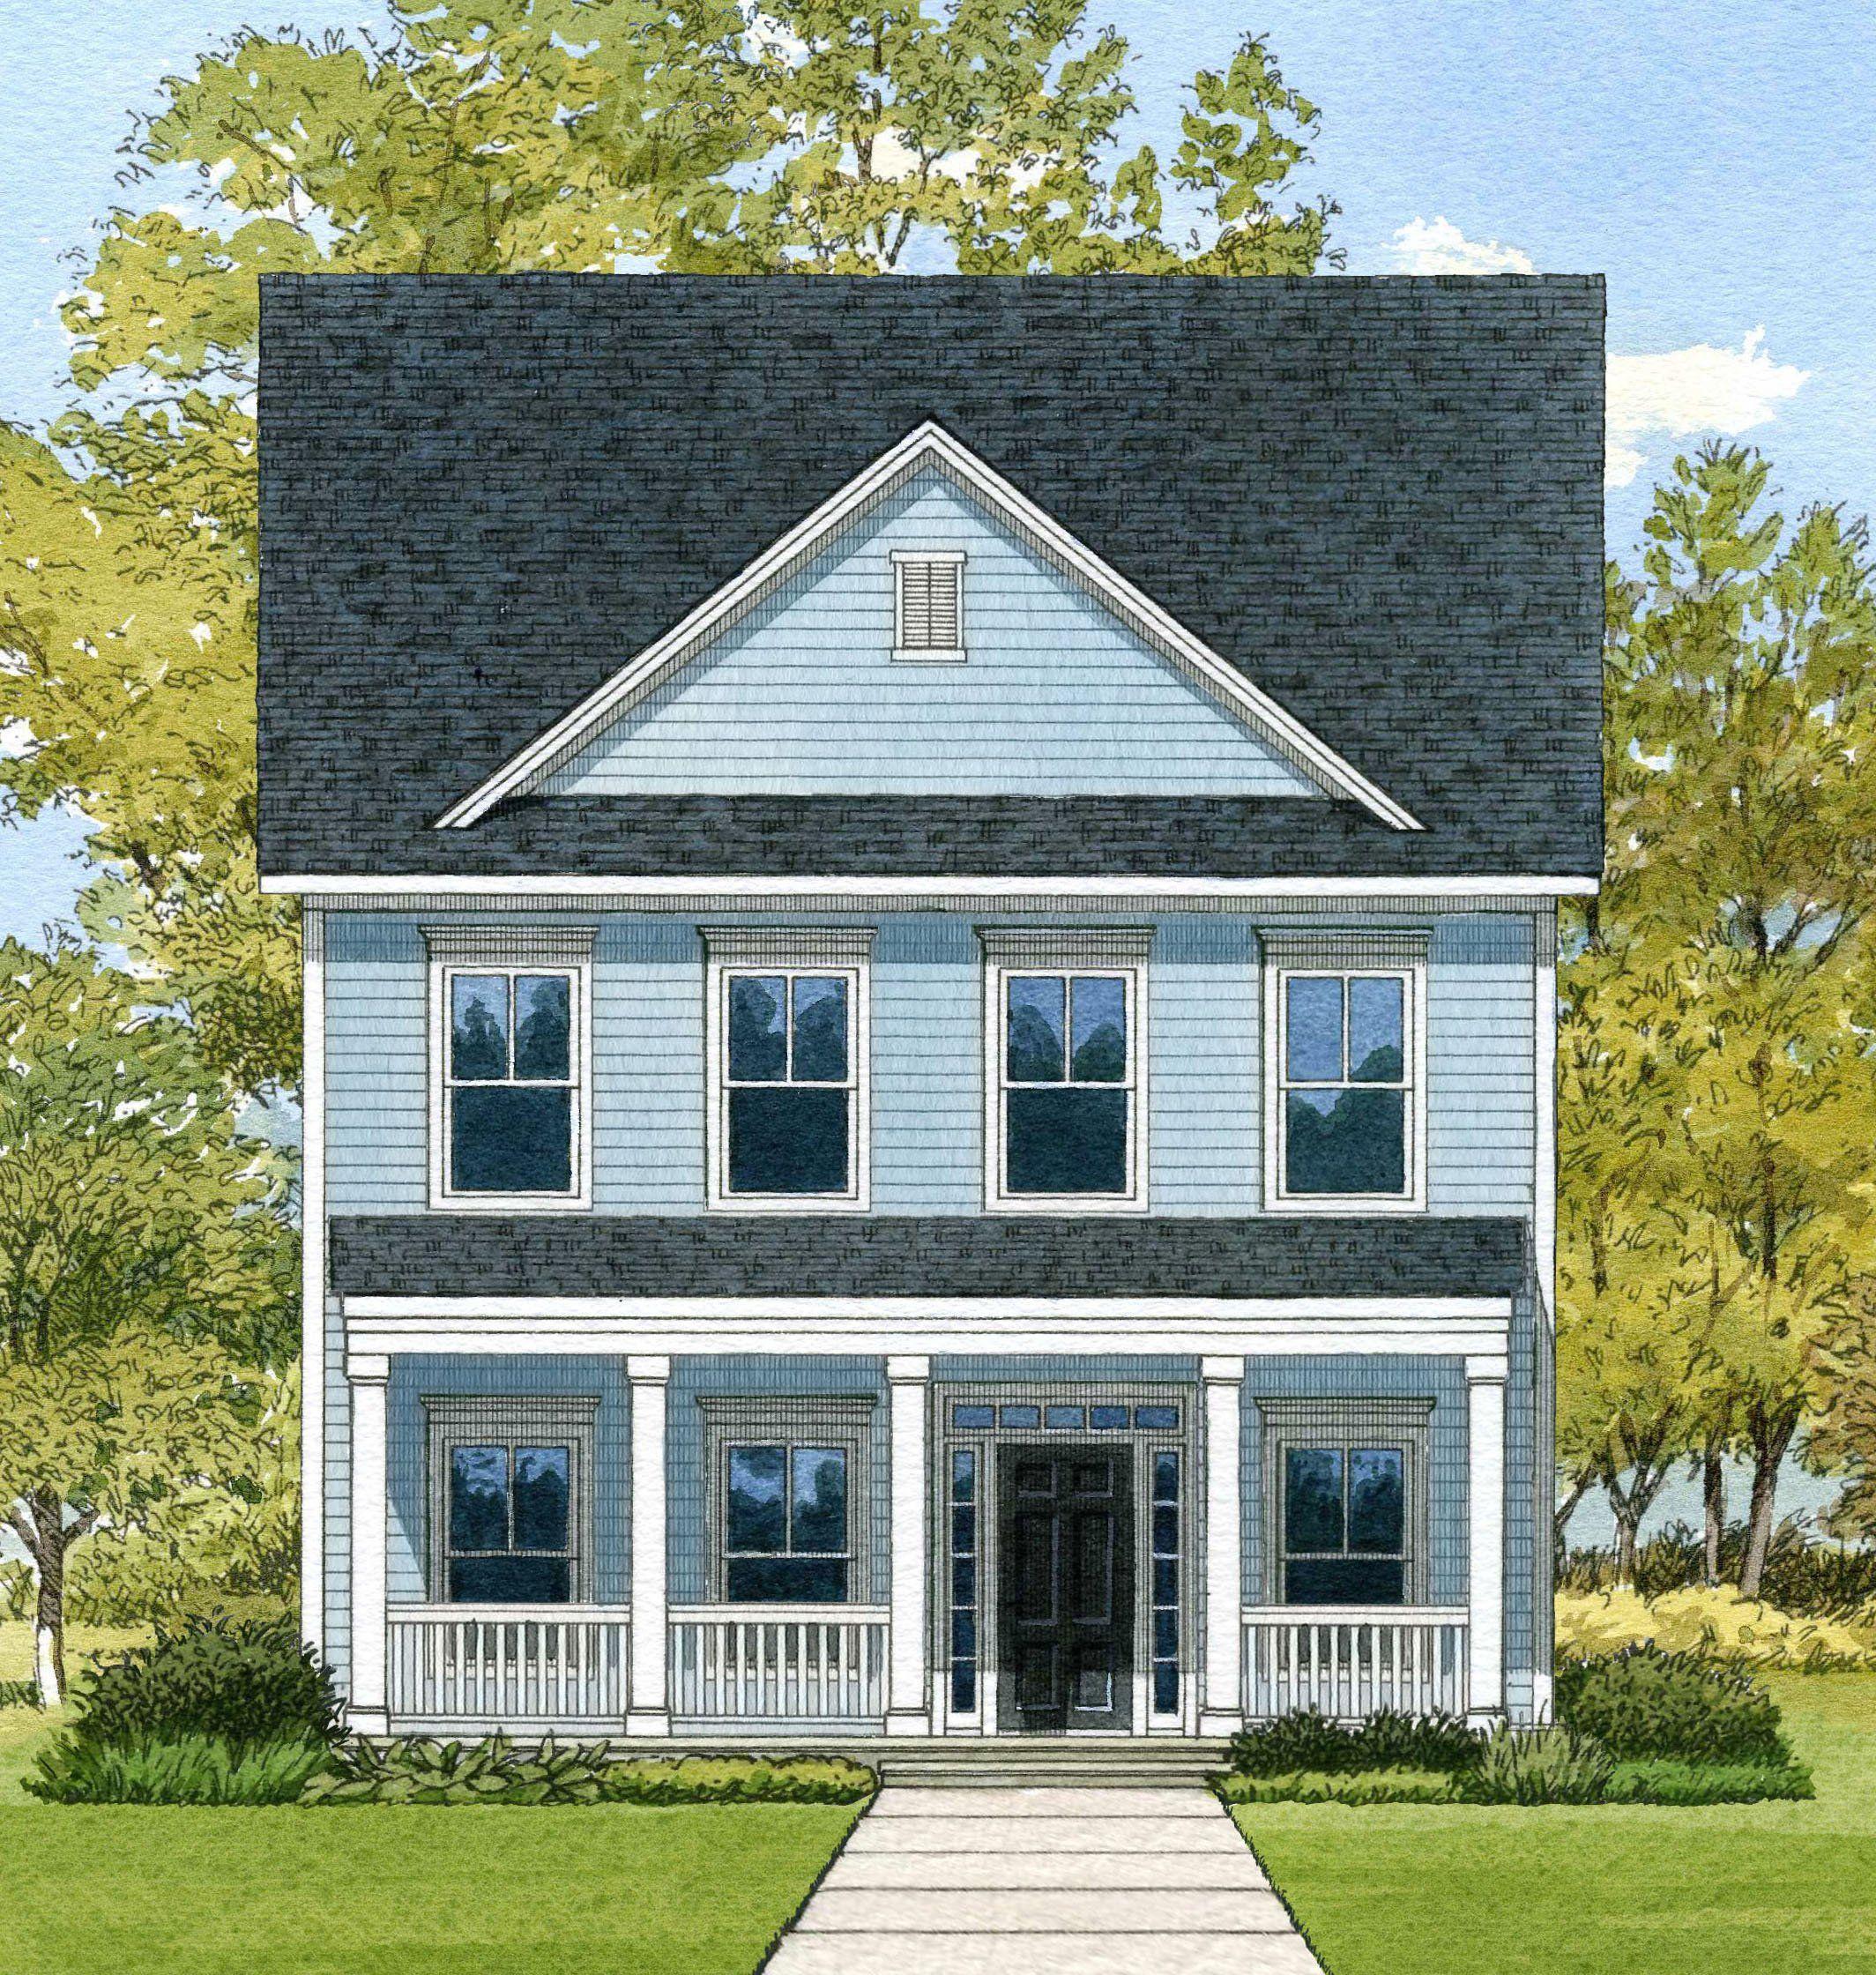 Charleston Sc Homes: Oak Terrace Preserve In North Charleston, SC, New Homes